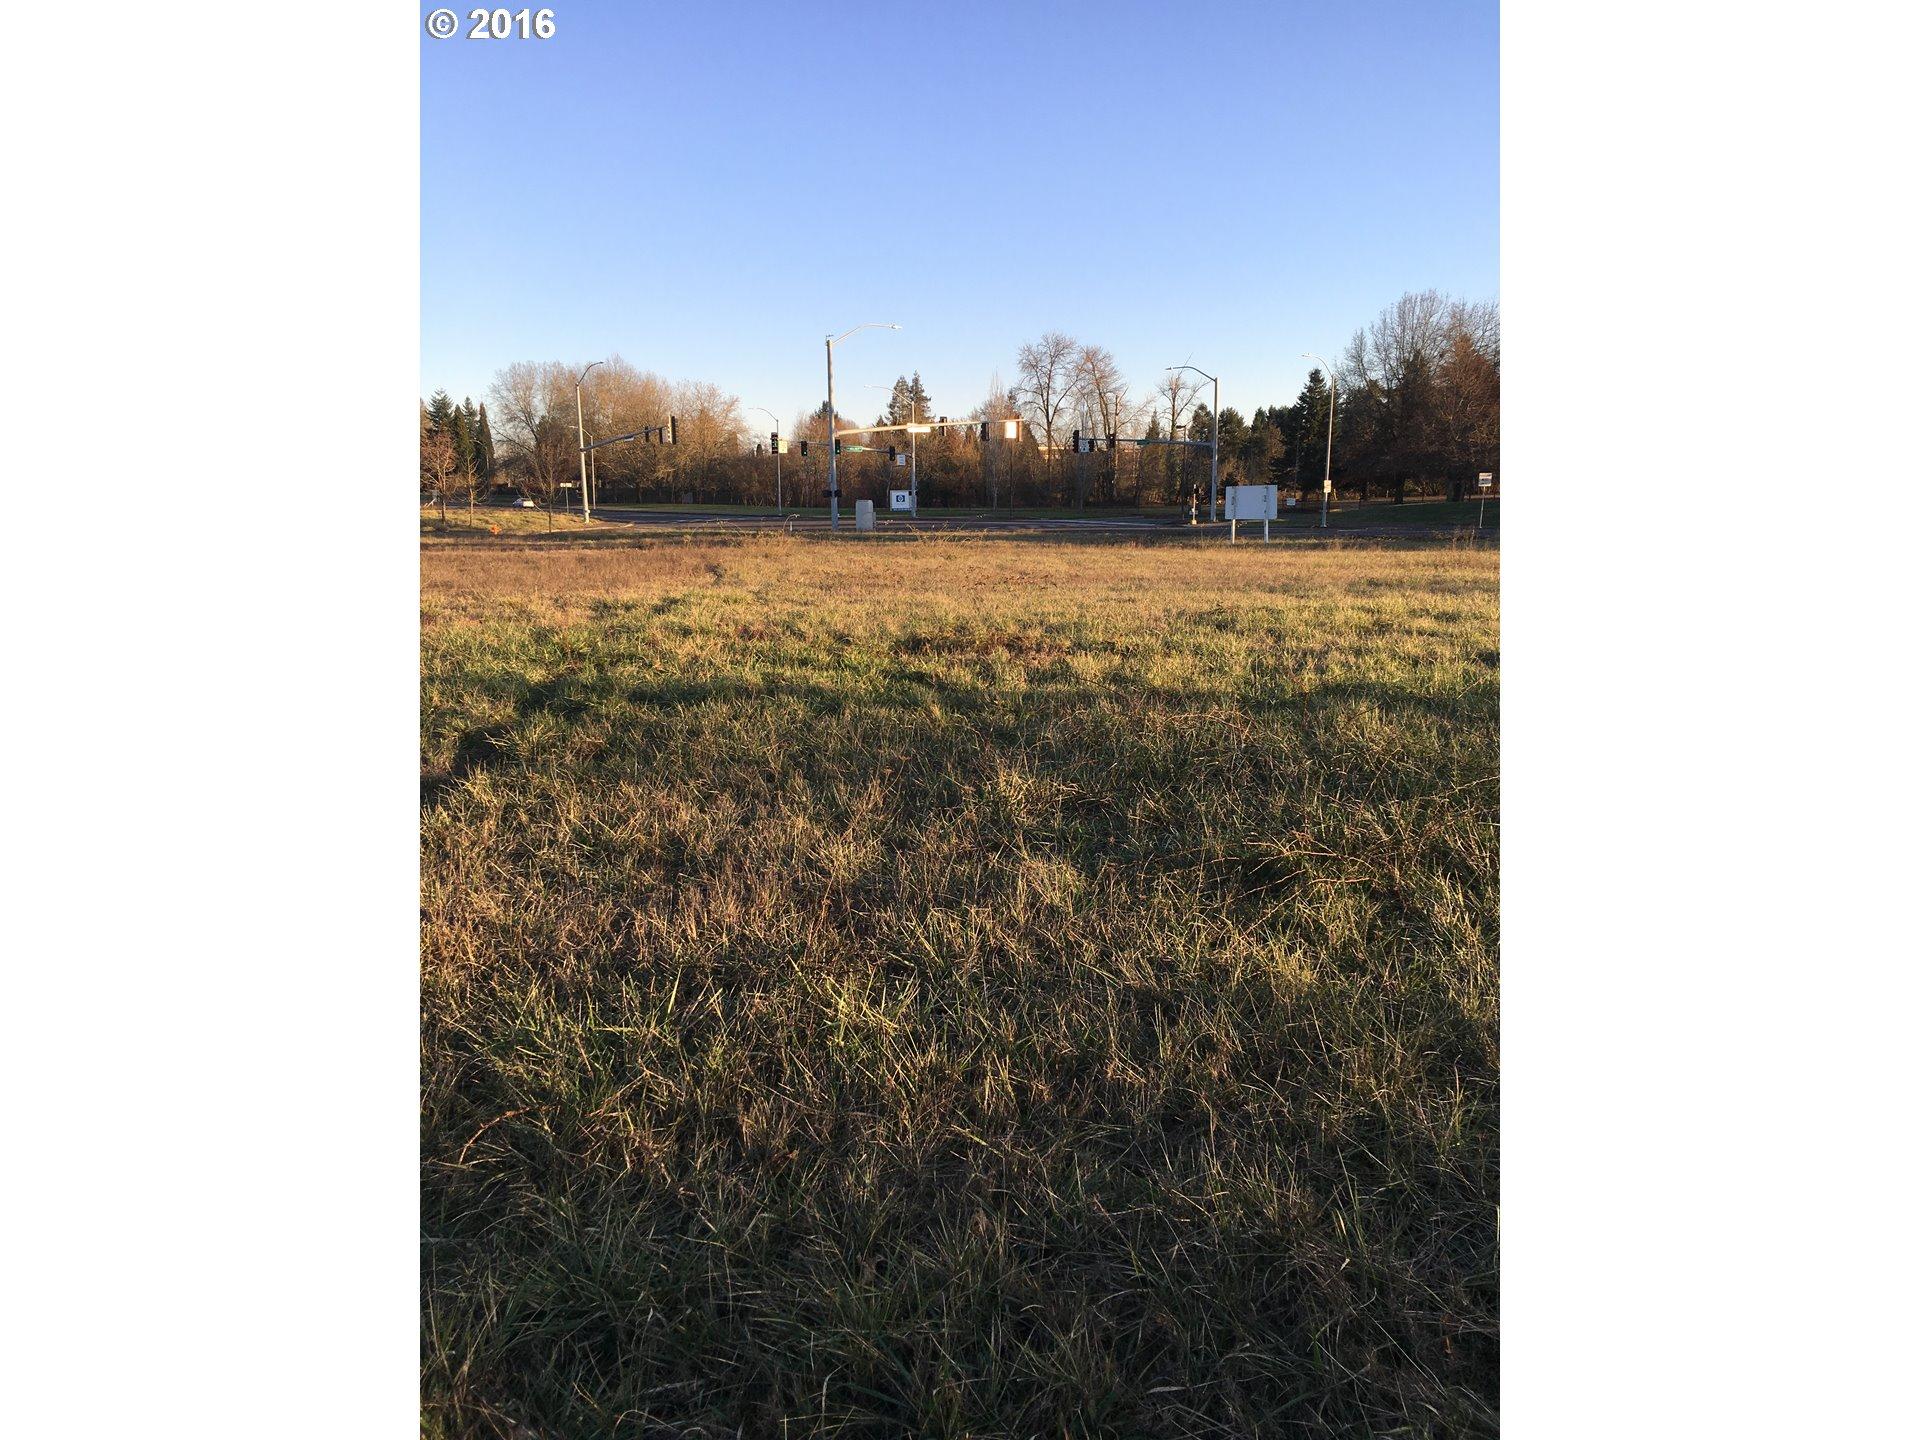 Corvallis, OR 97330